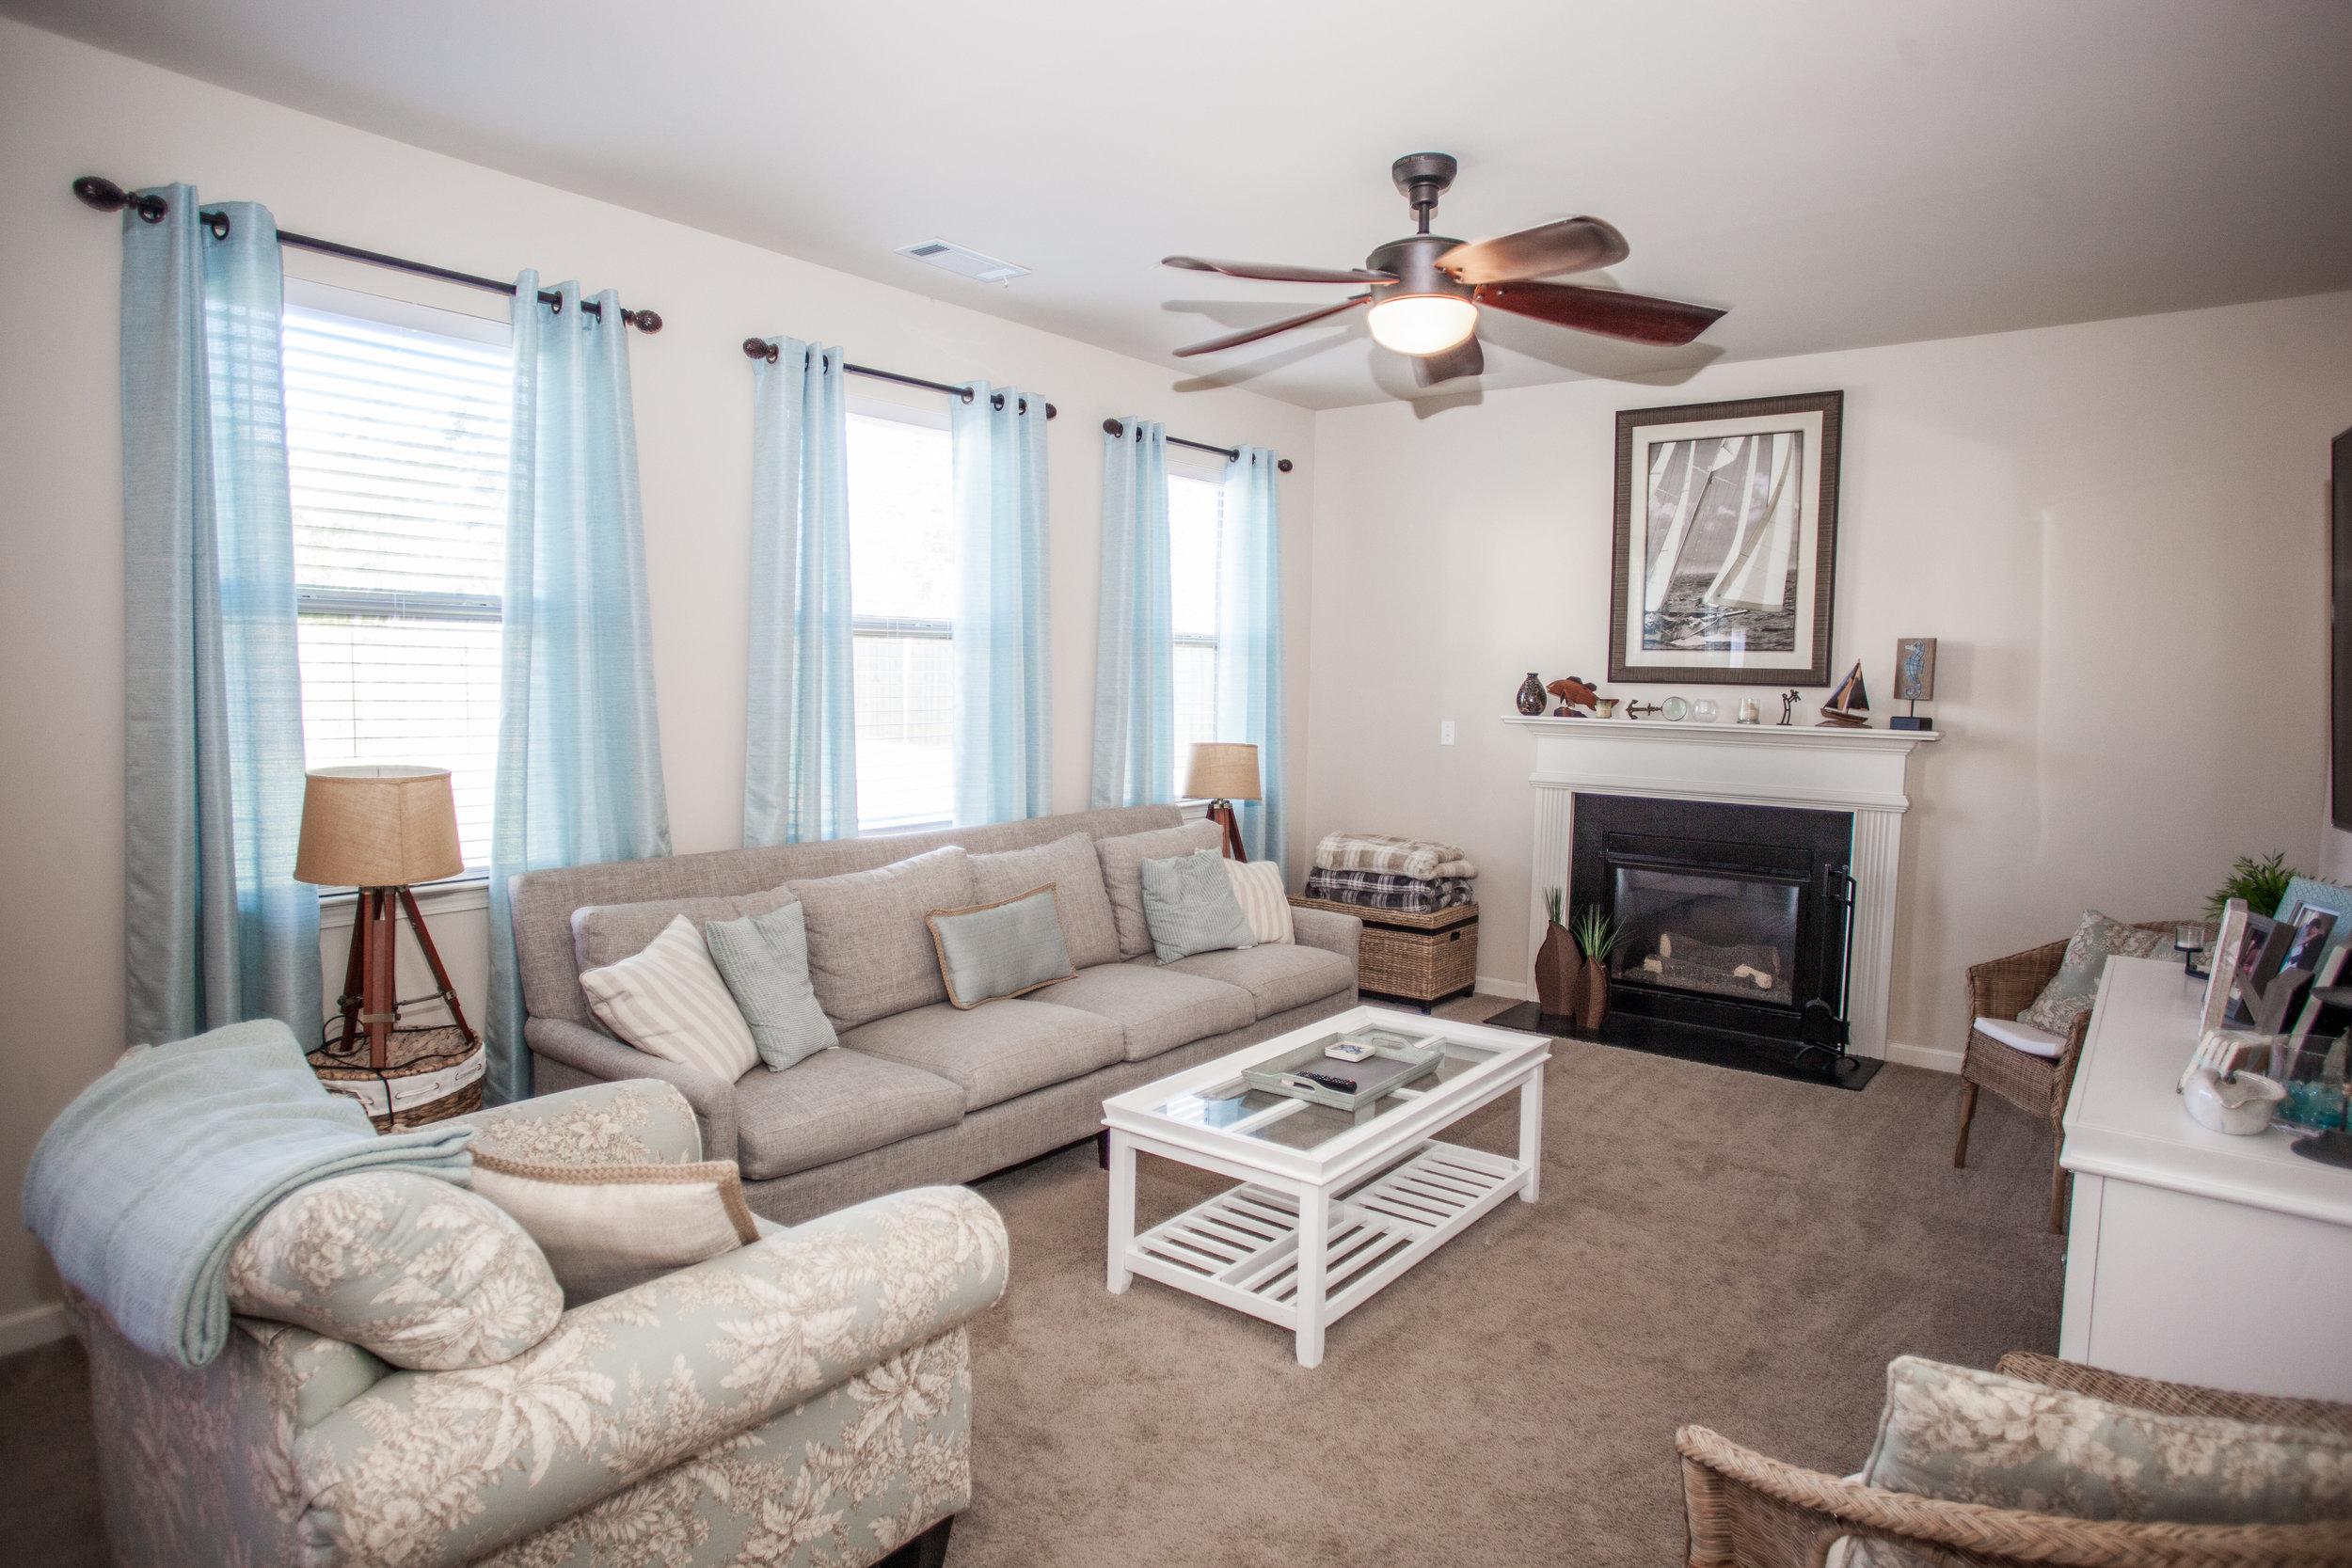 woodstock-ga-house-for-sale-wingard-real-estate-under-300k-43.jpg